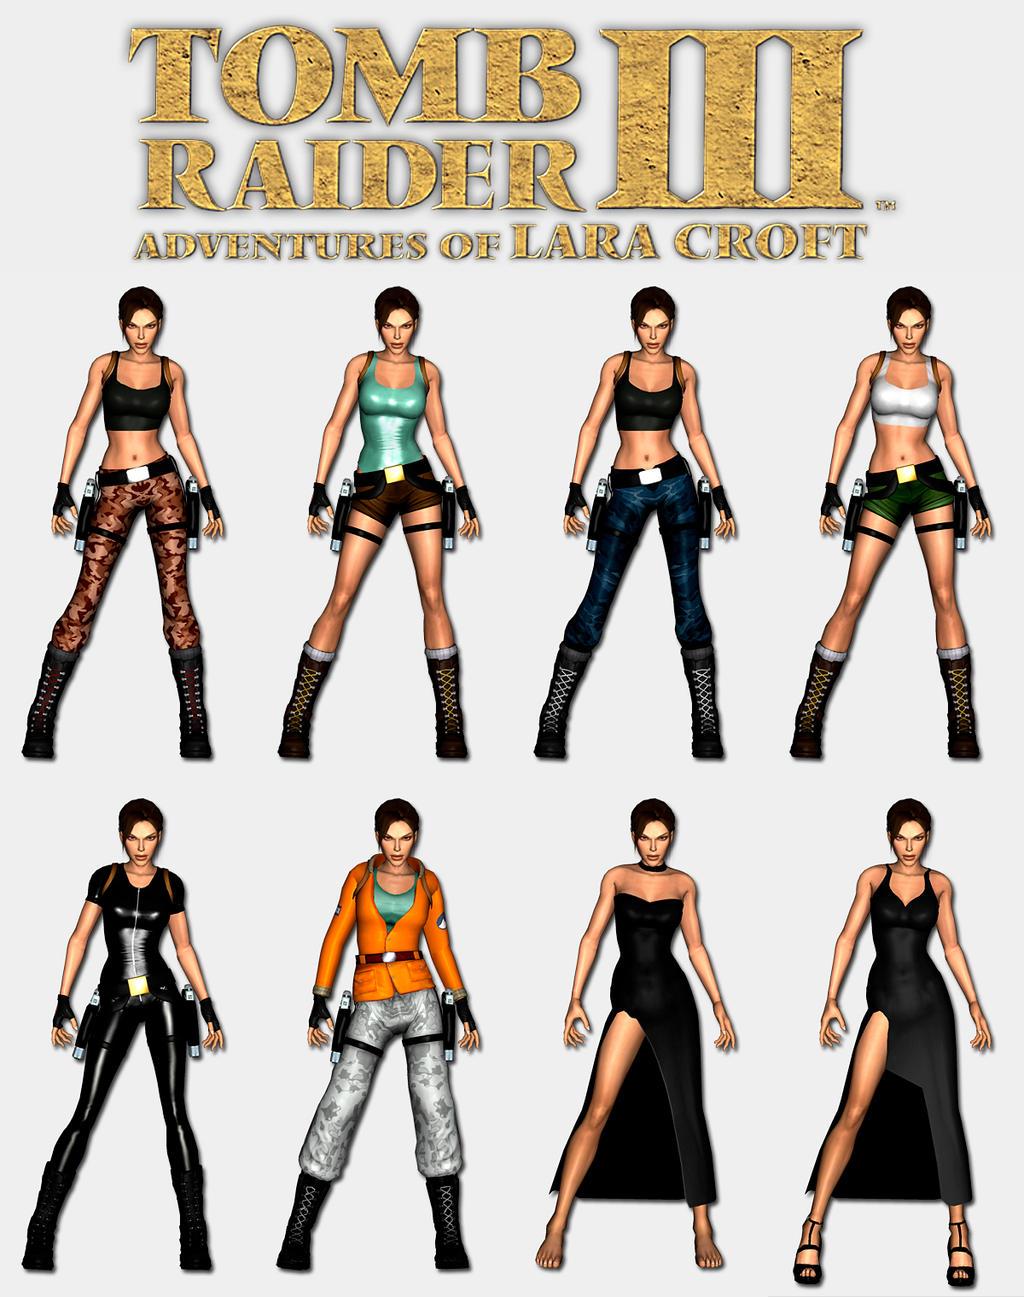 Lara Croft S Outfits Of Tomb Raider Video Games Triton World